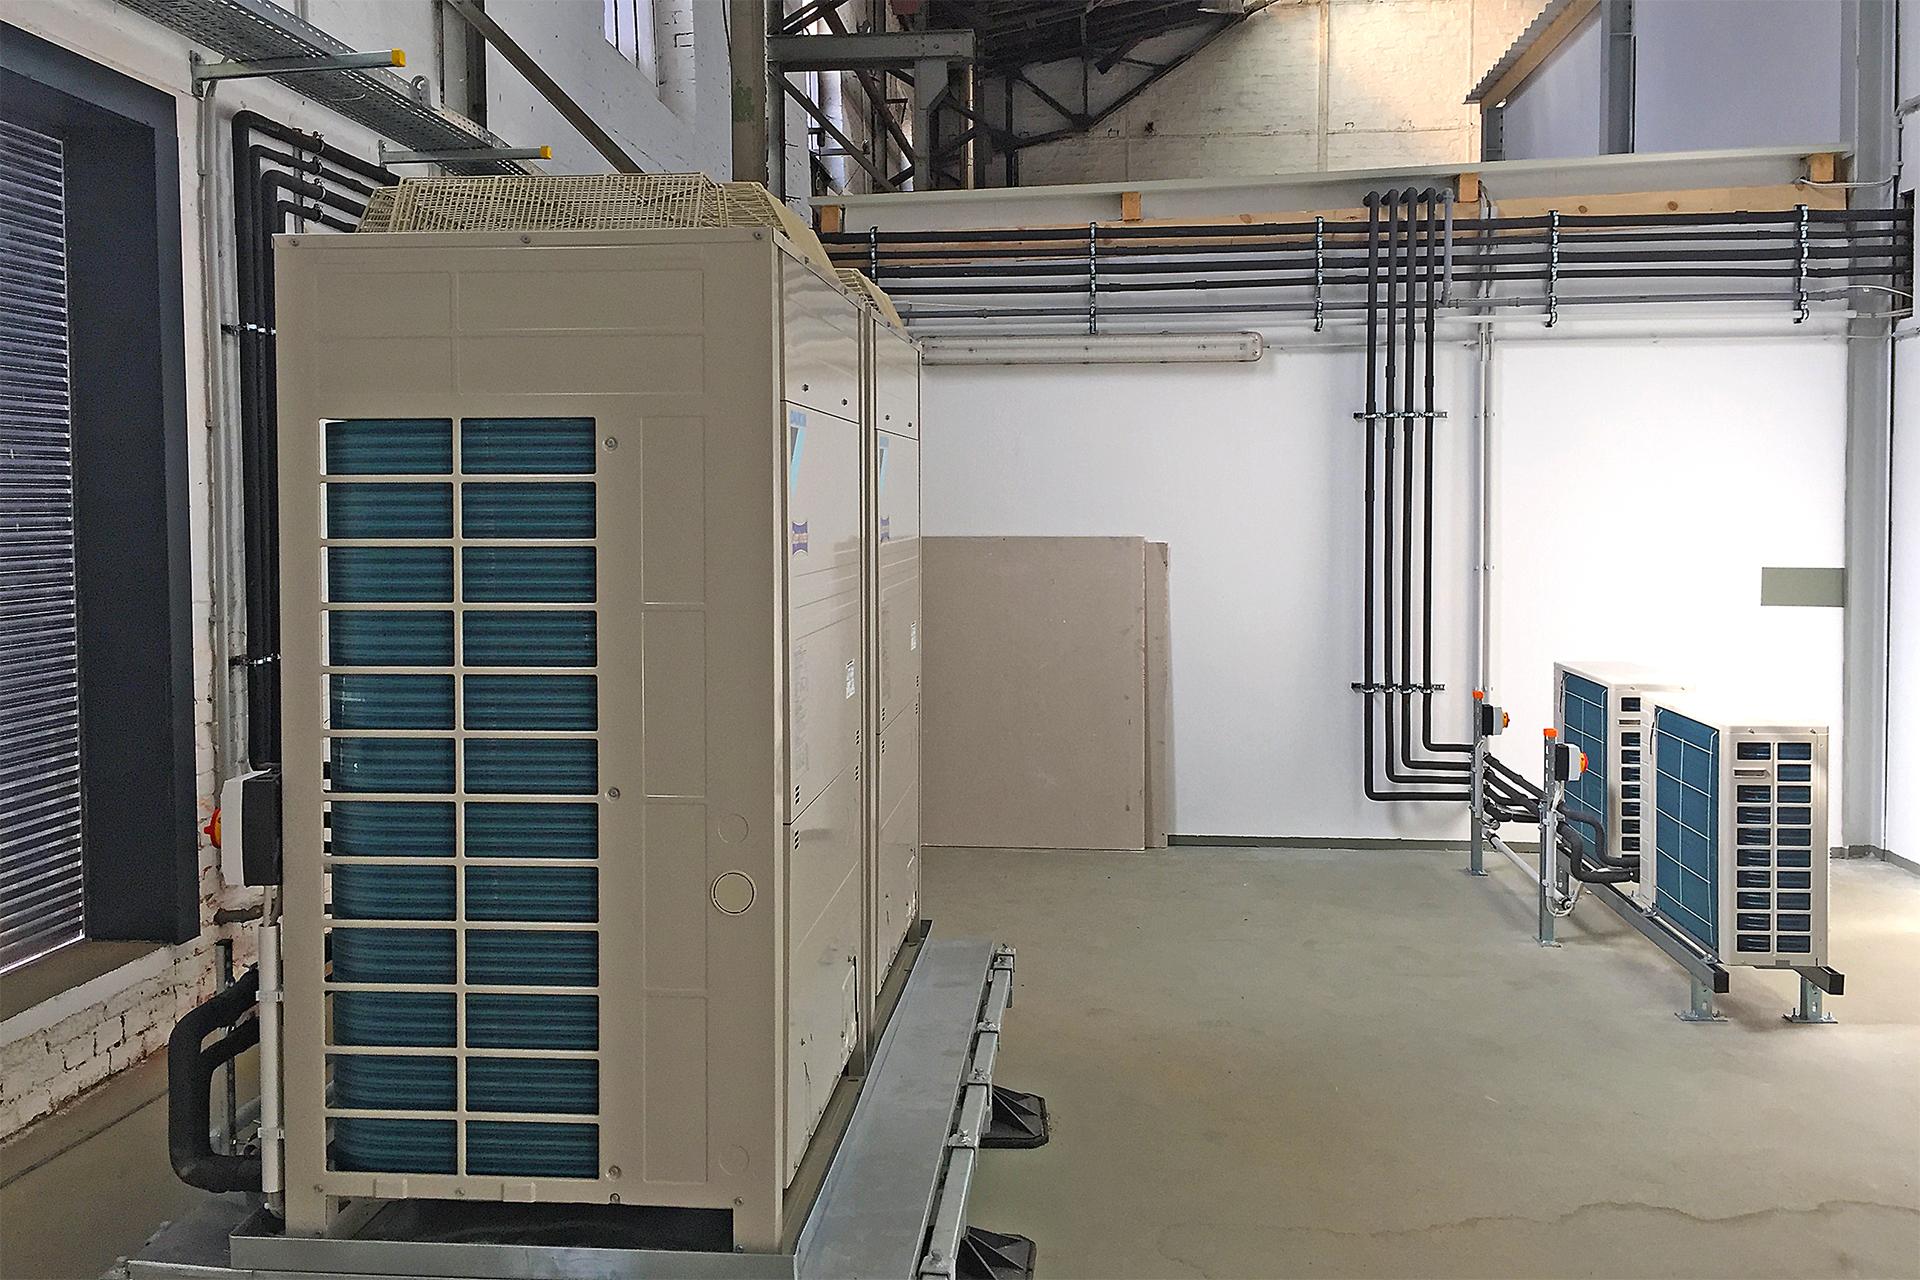 Klimatechnik - Klima-Installation Industrie